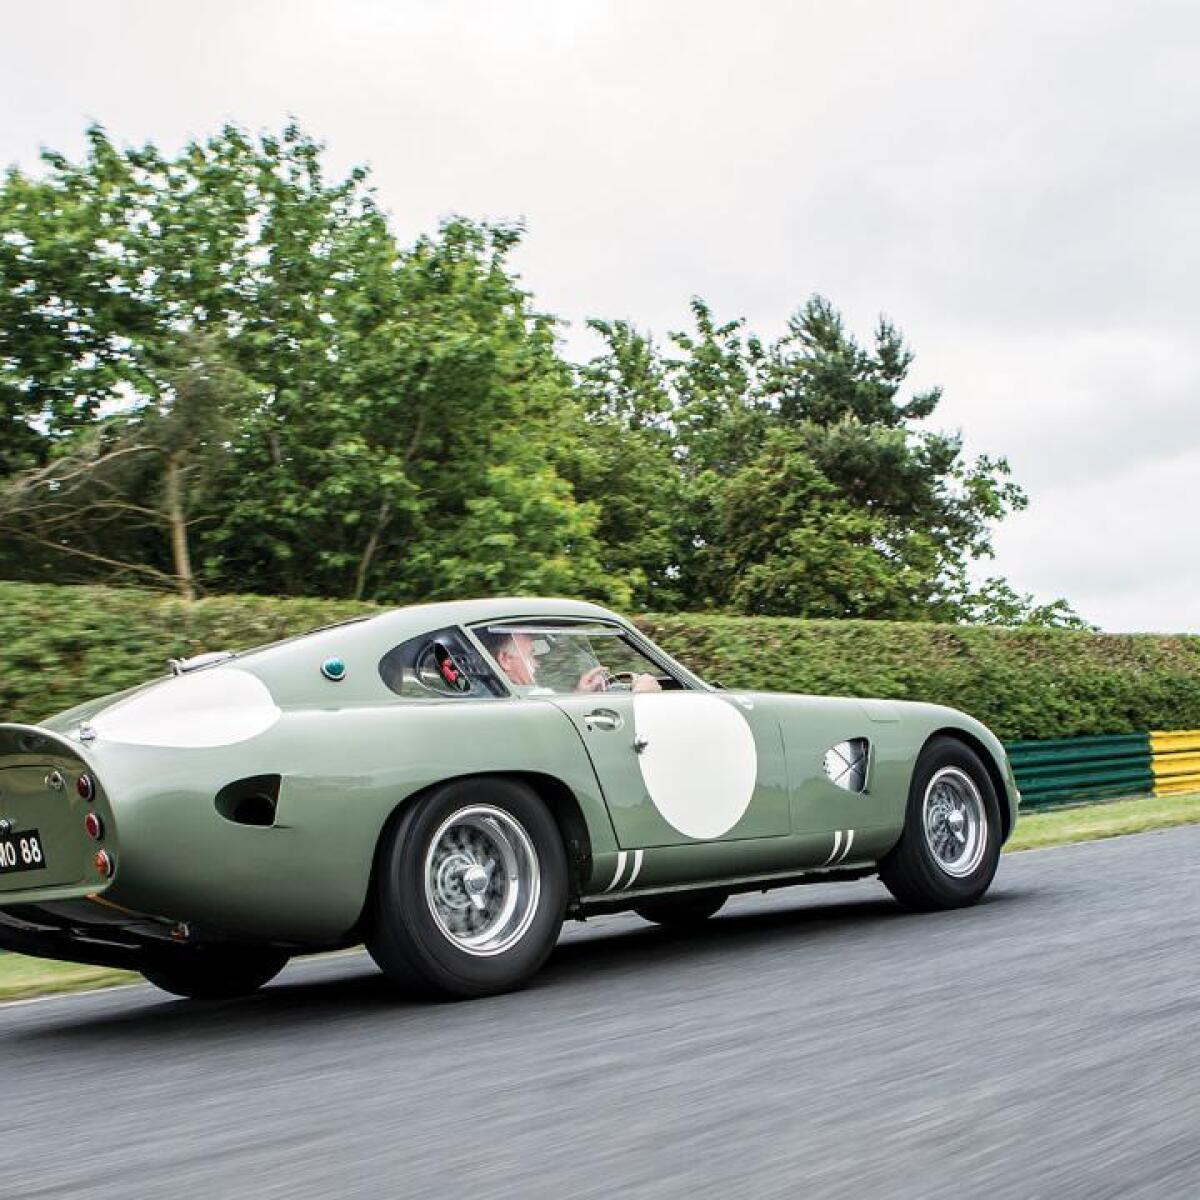 The Aston Martin That Broke 300KPH